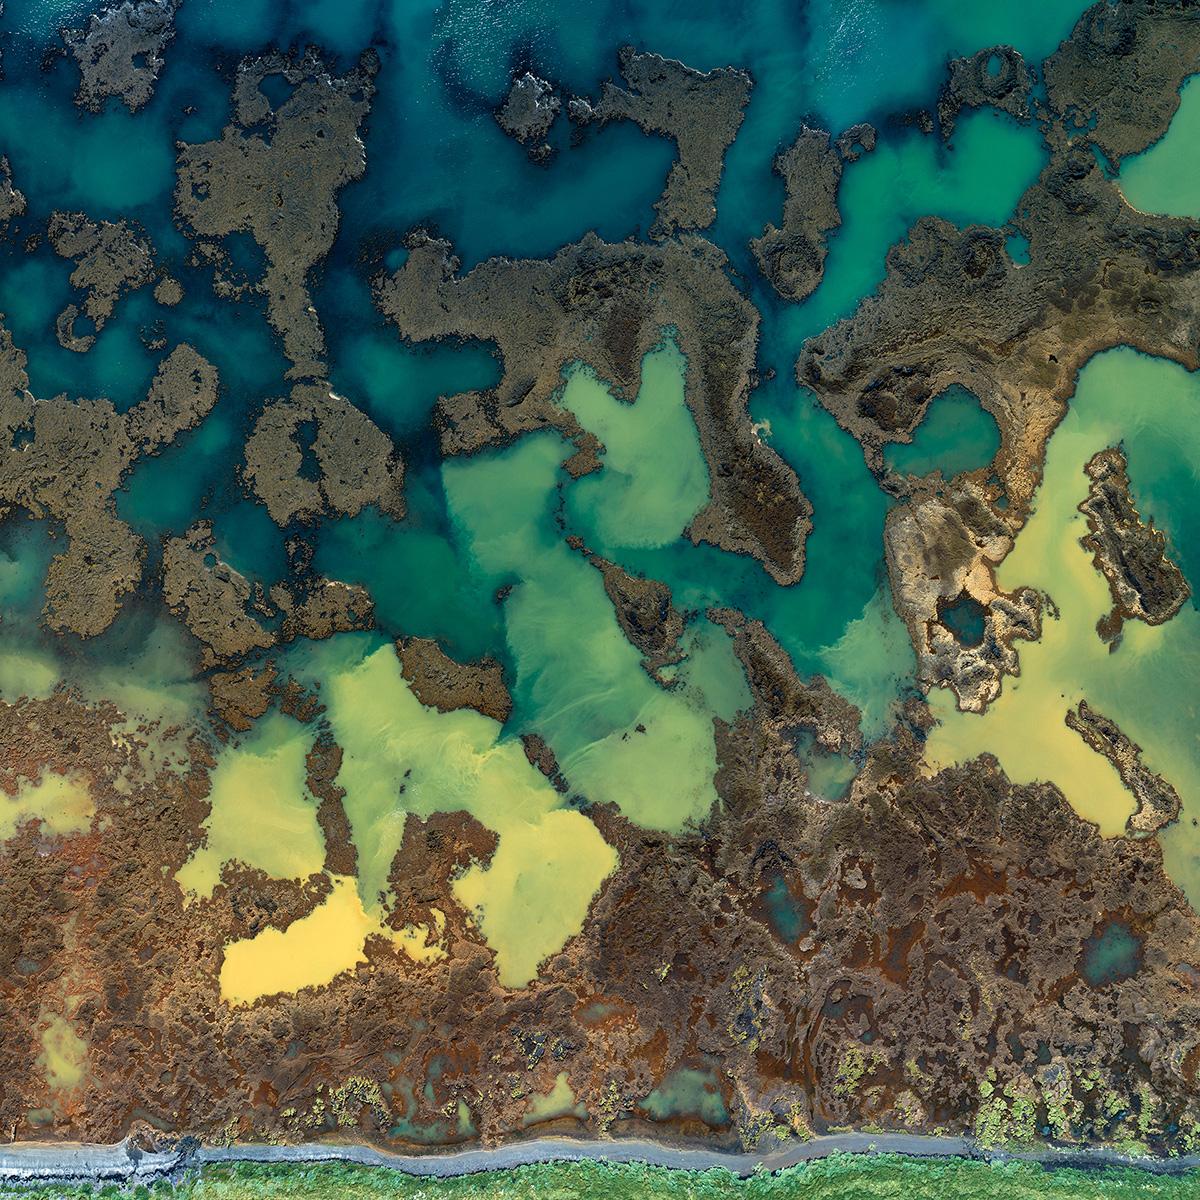 06-water-shape-earth-watershape.earth-milan-radisics-photography-fine-art-print-milan.hu_